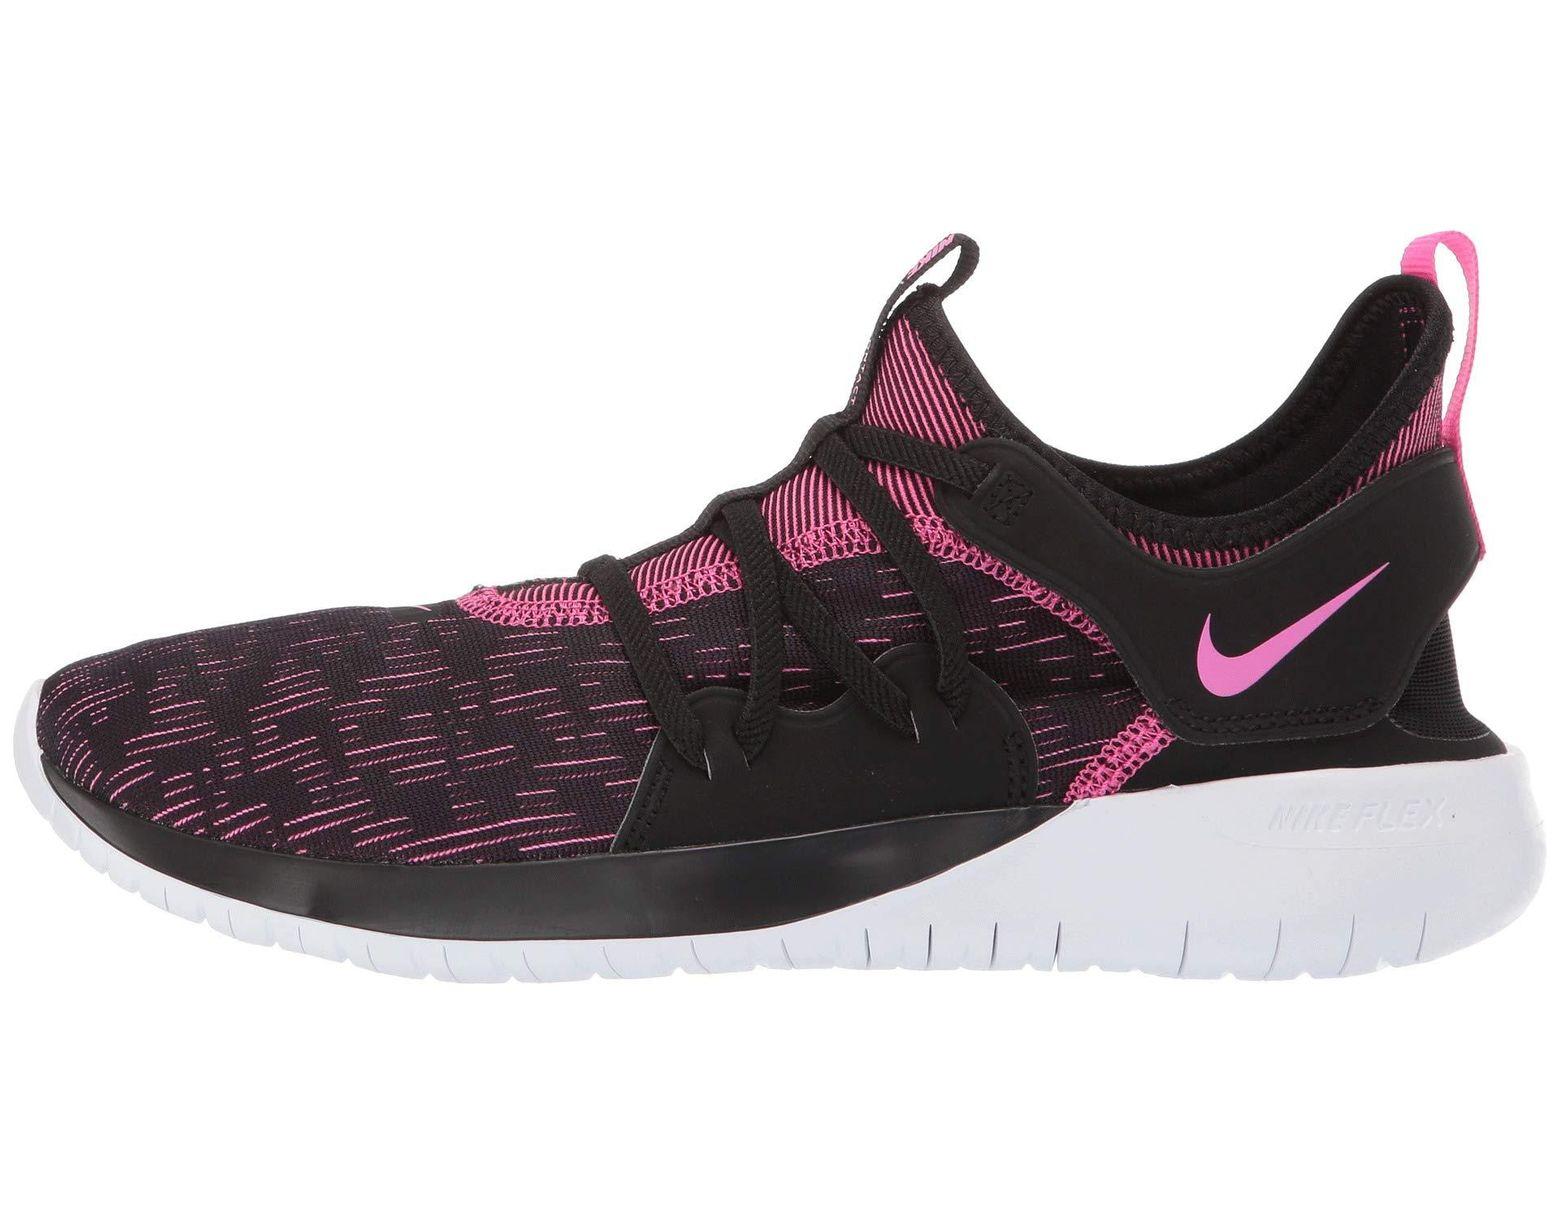 b7aef066c7fe Lyst - Nike Flex Contact 3 (black laser Fuchsia white) Women s Running Shoes  in Black